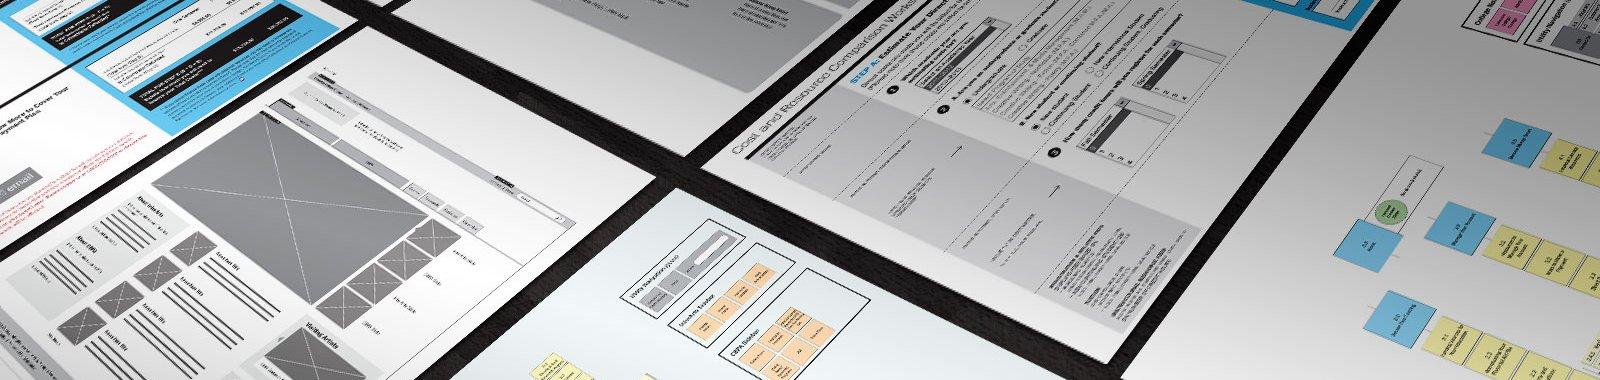 UX Open Design